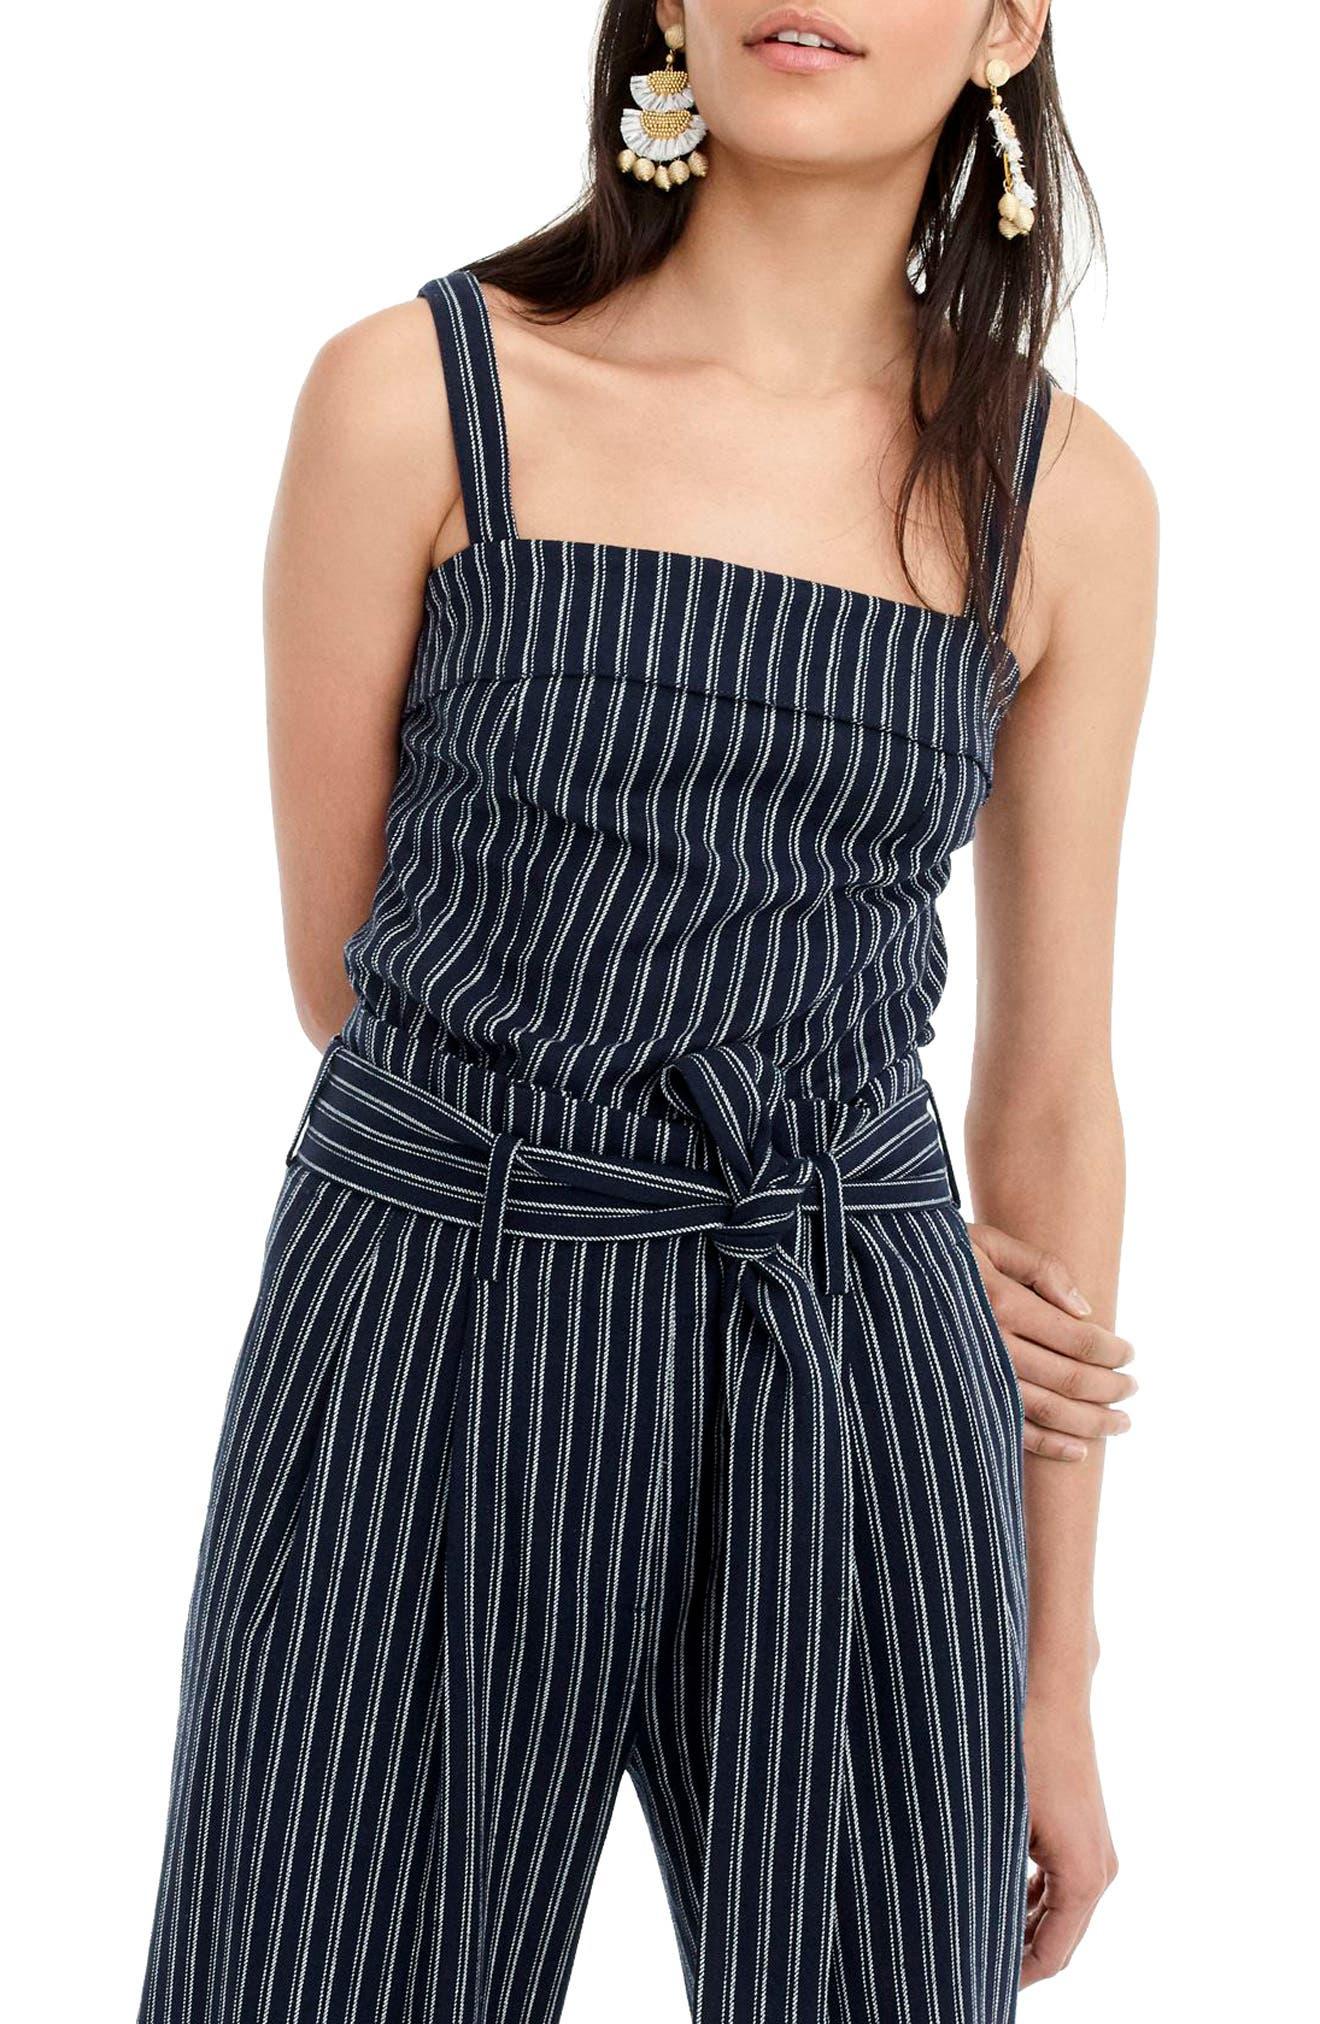 J.CREW Turnover Stripe Linen & Cotton Top, Main, color, 400